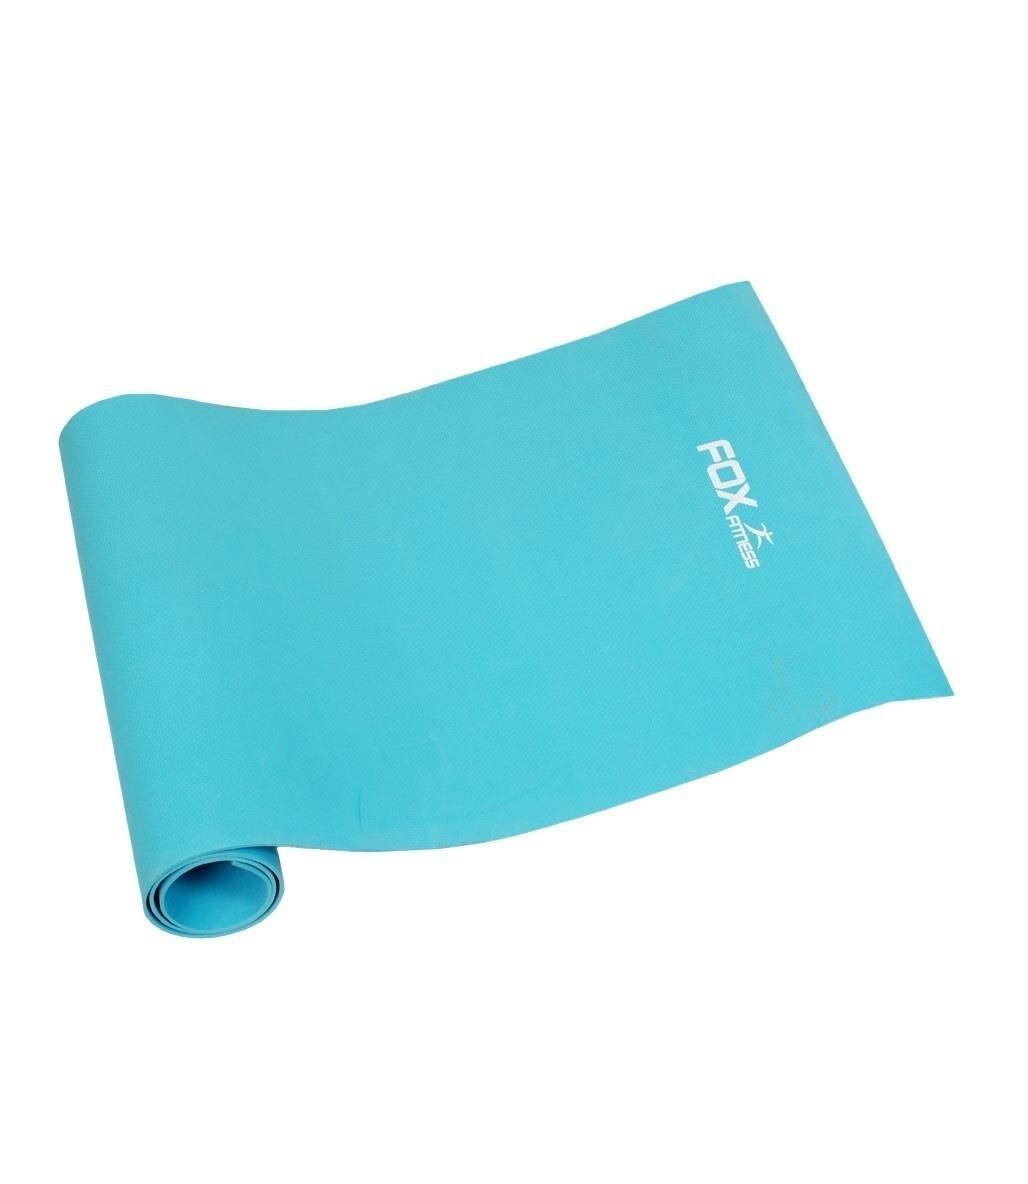 Fox Fitness Yoga/Pilates Minderi 4 mm